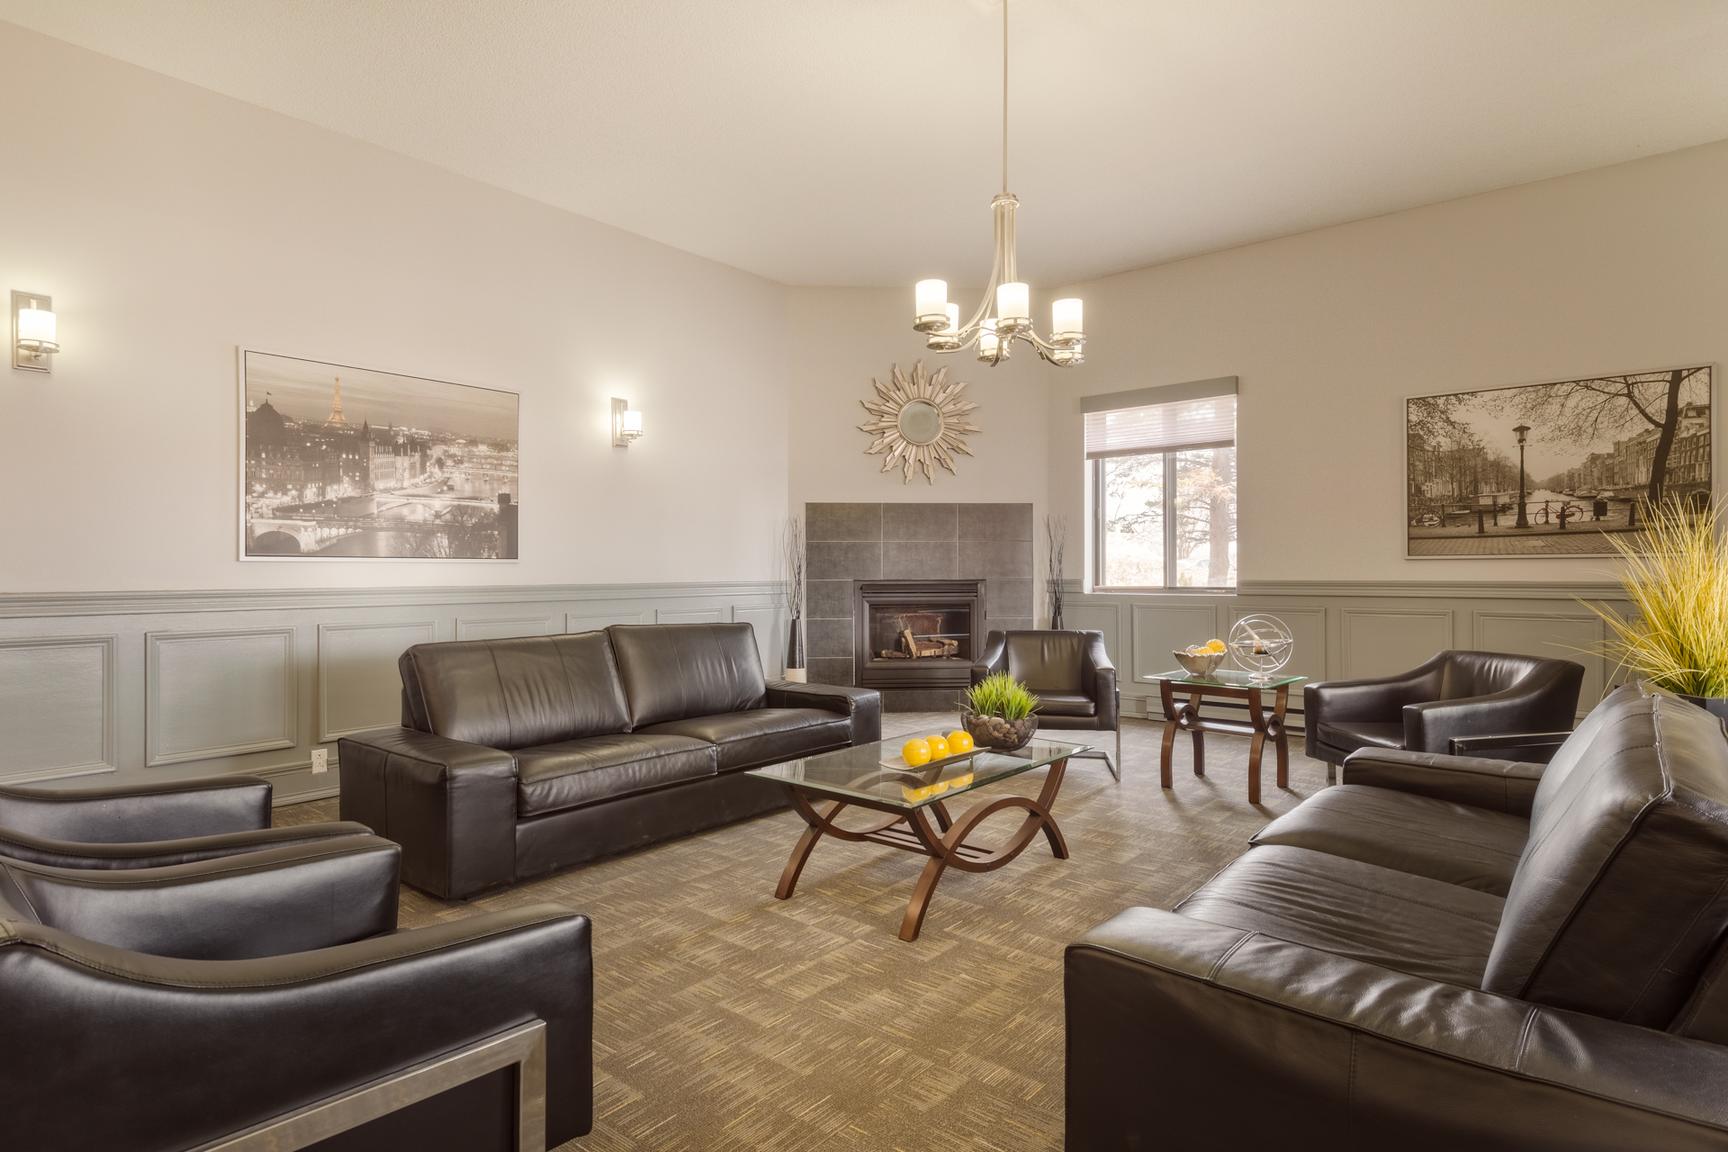 1 bedroom Apartments for rent in Laval at Le Quatre Cent - Photo 24 - RentQuebecApartments – L407183